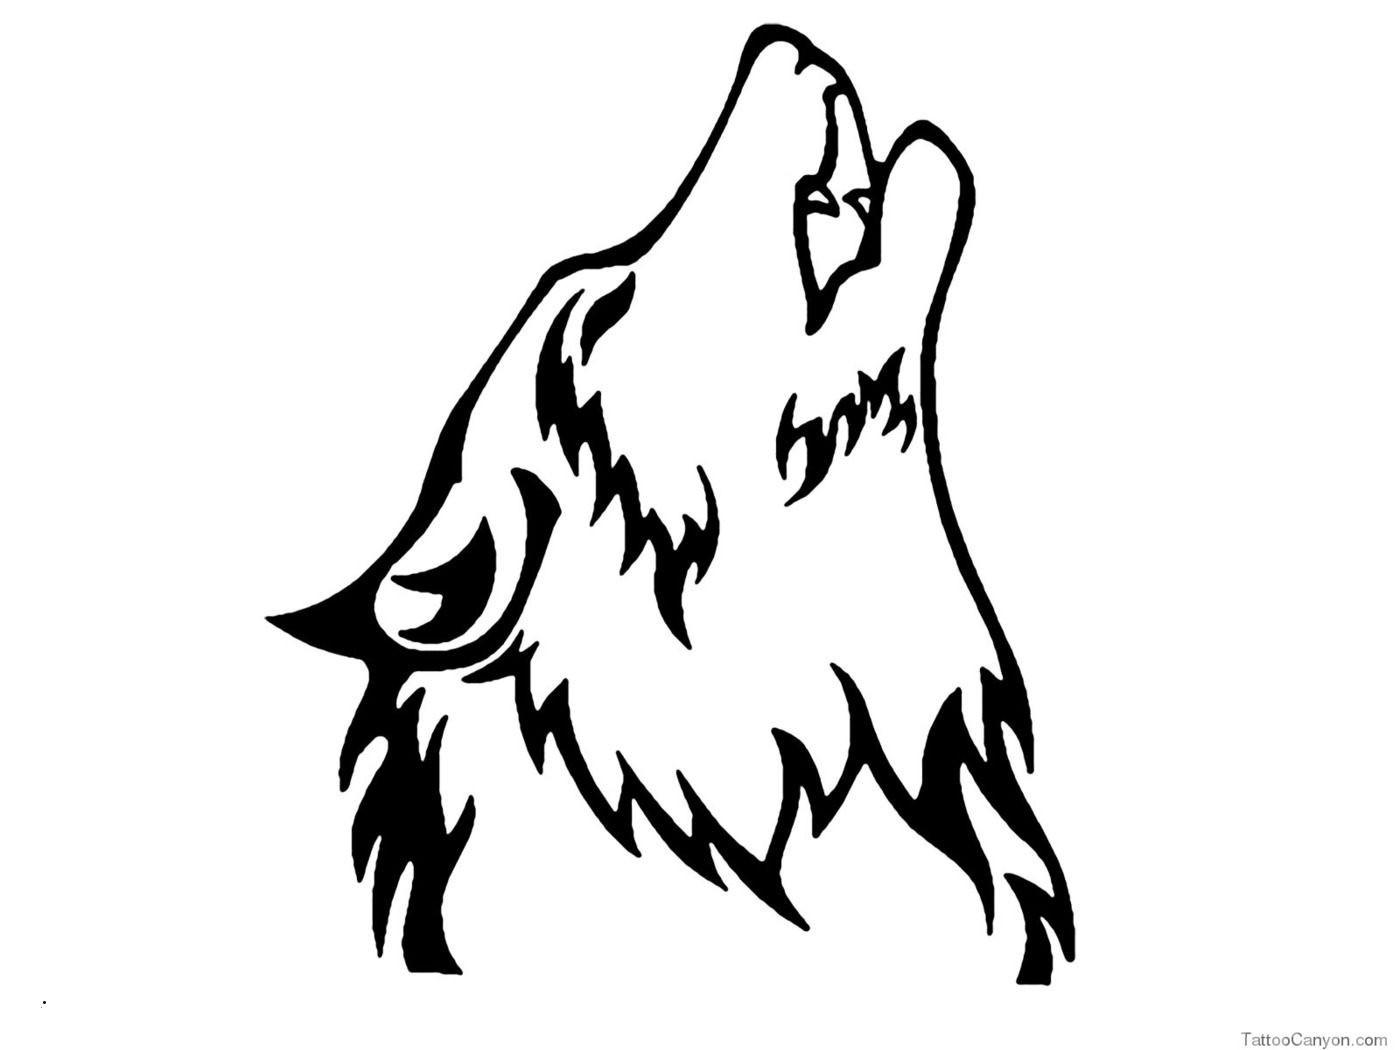 1400x1050 howling clipart elegant ausmalbilder the walking dead best howling